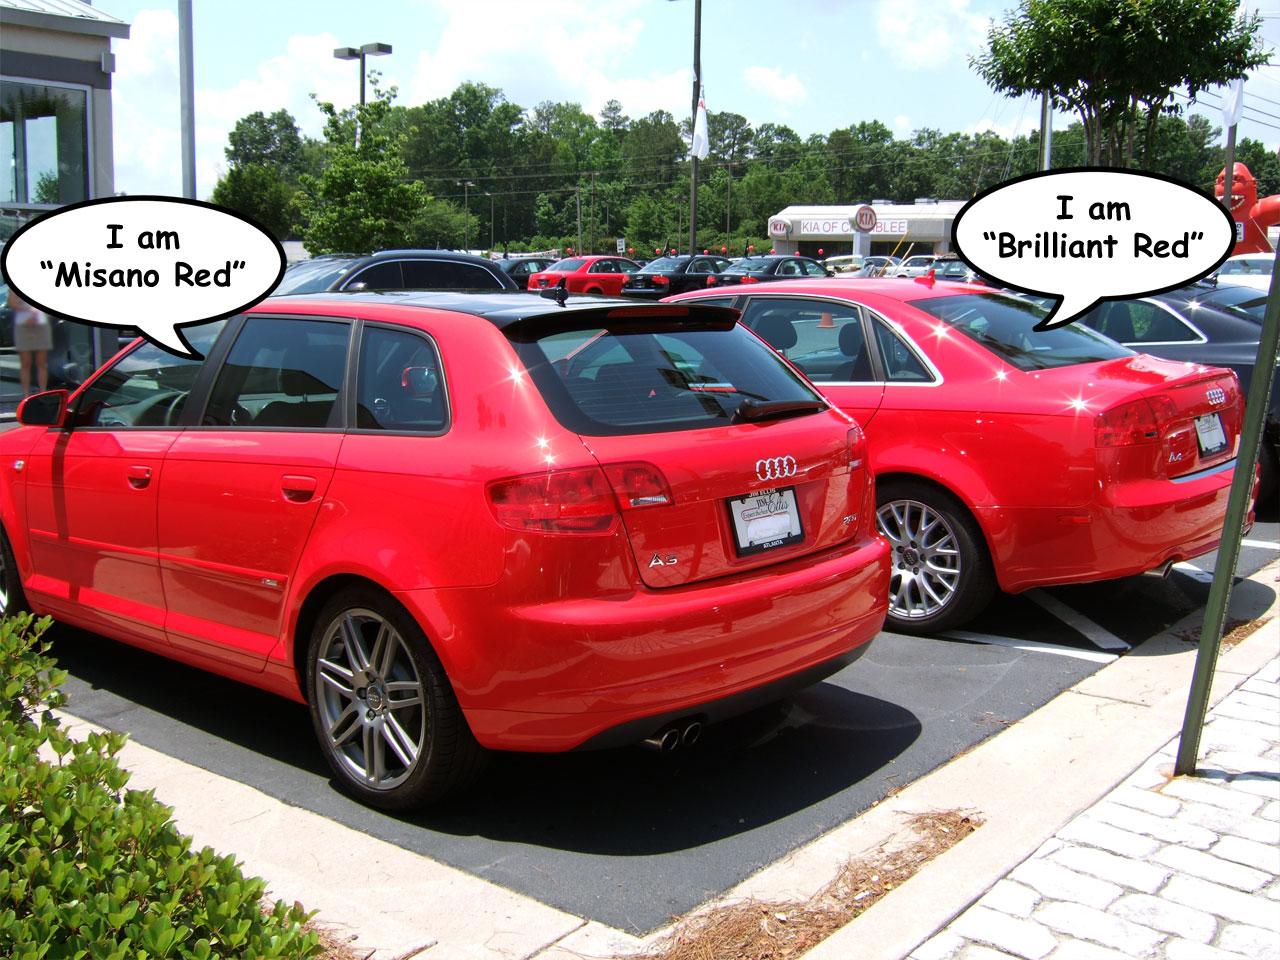 Authoritative Misano Red Vs Brilliant Red Comparison